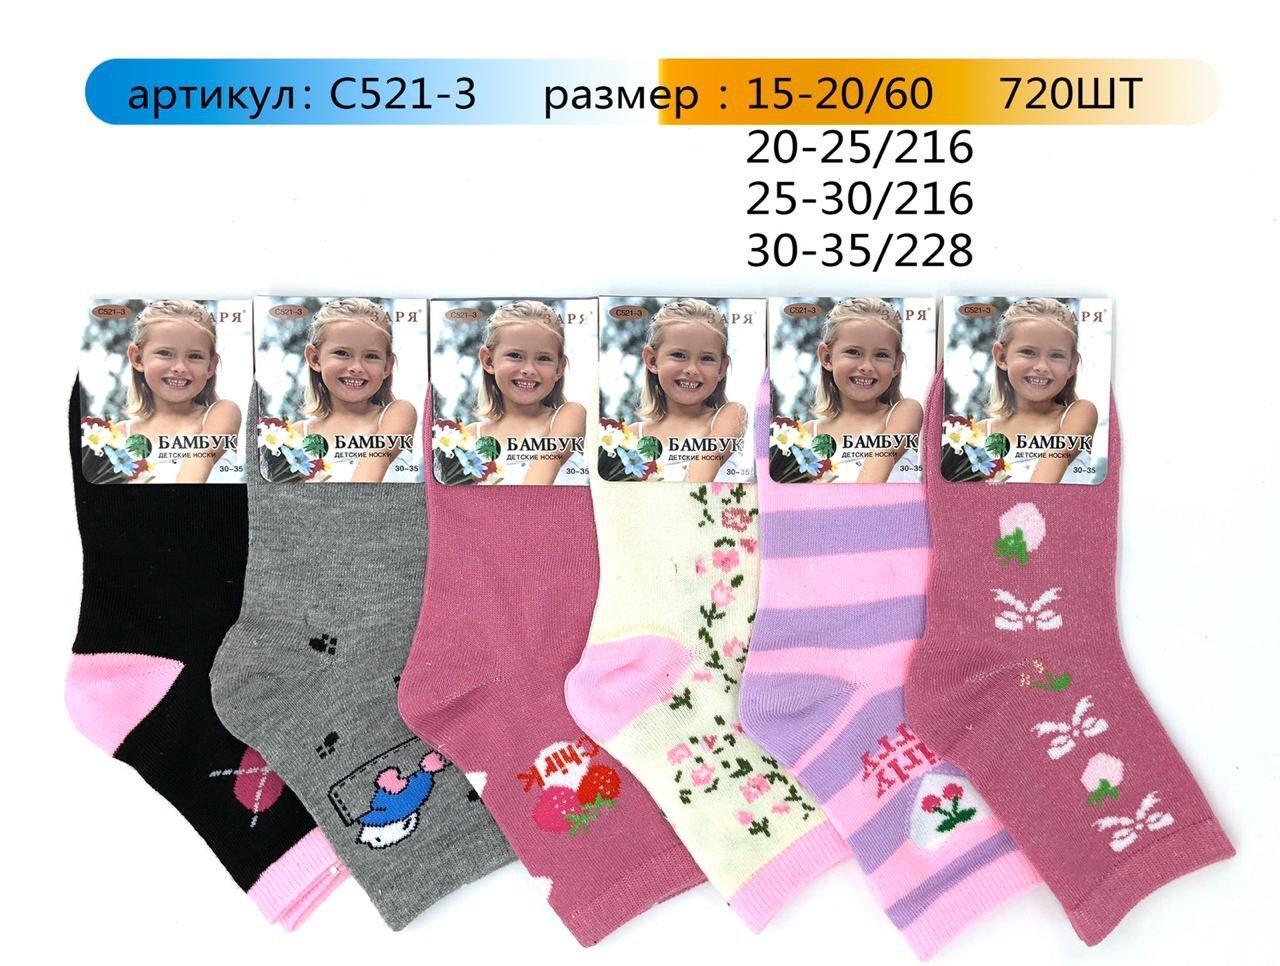 Детские носки Бамбук хлопок Р.р